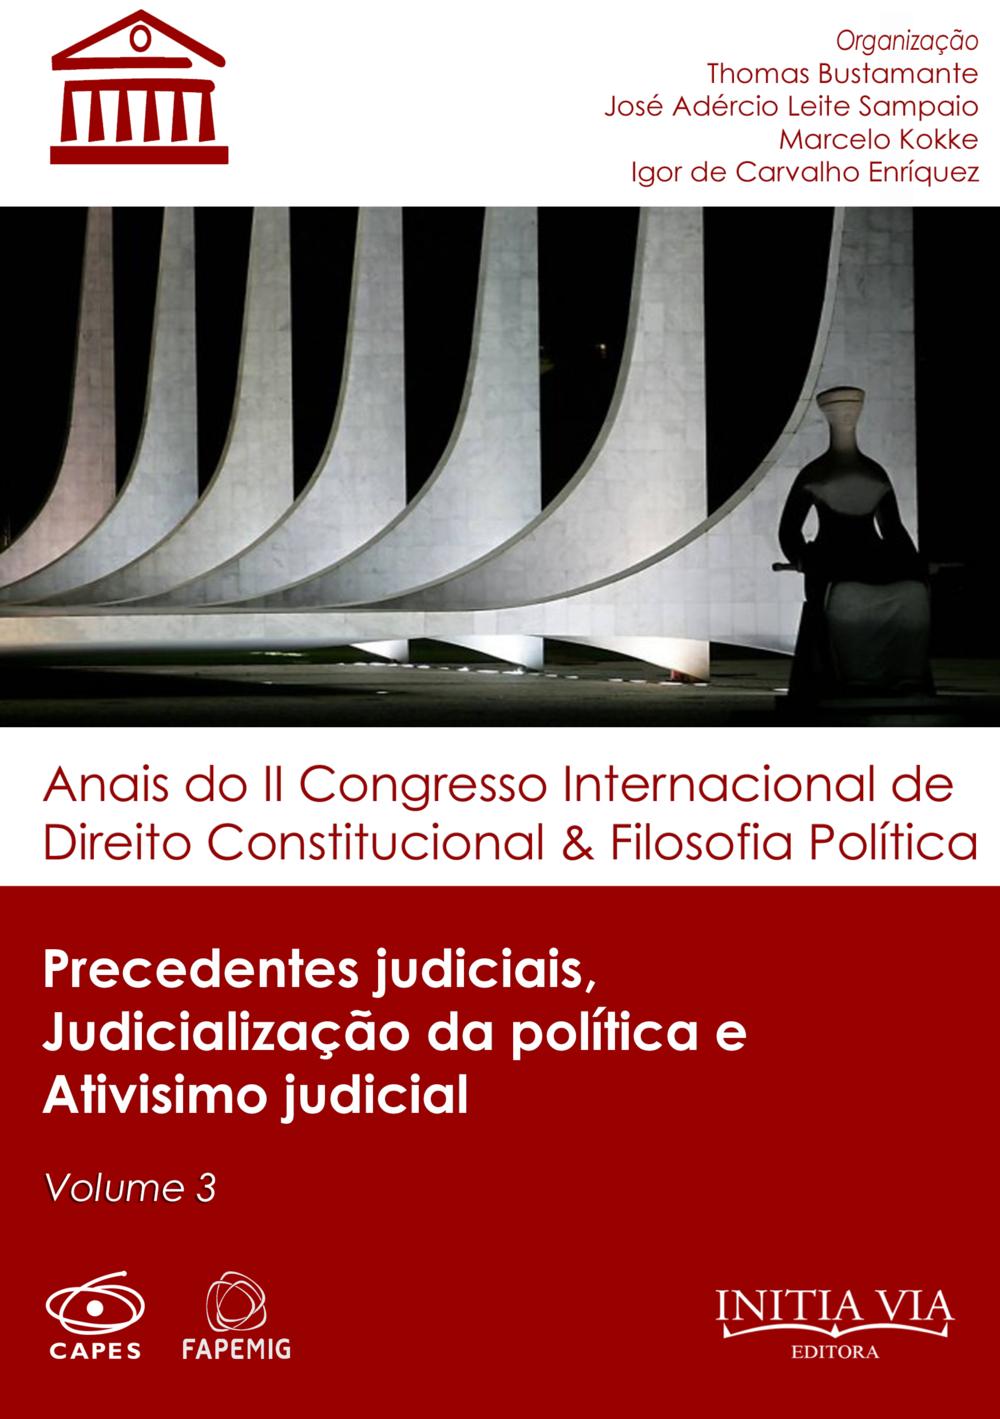 Bustamante_Congresso_DCFP15_V03.png